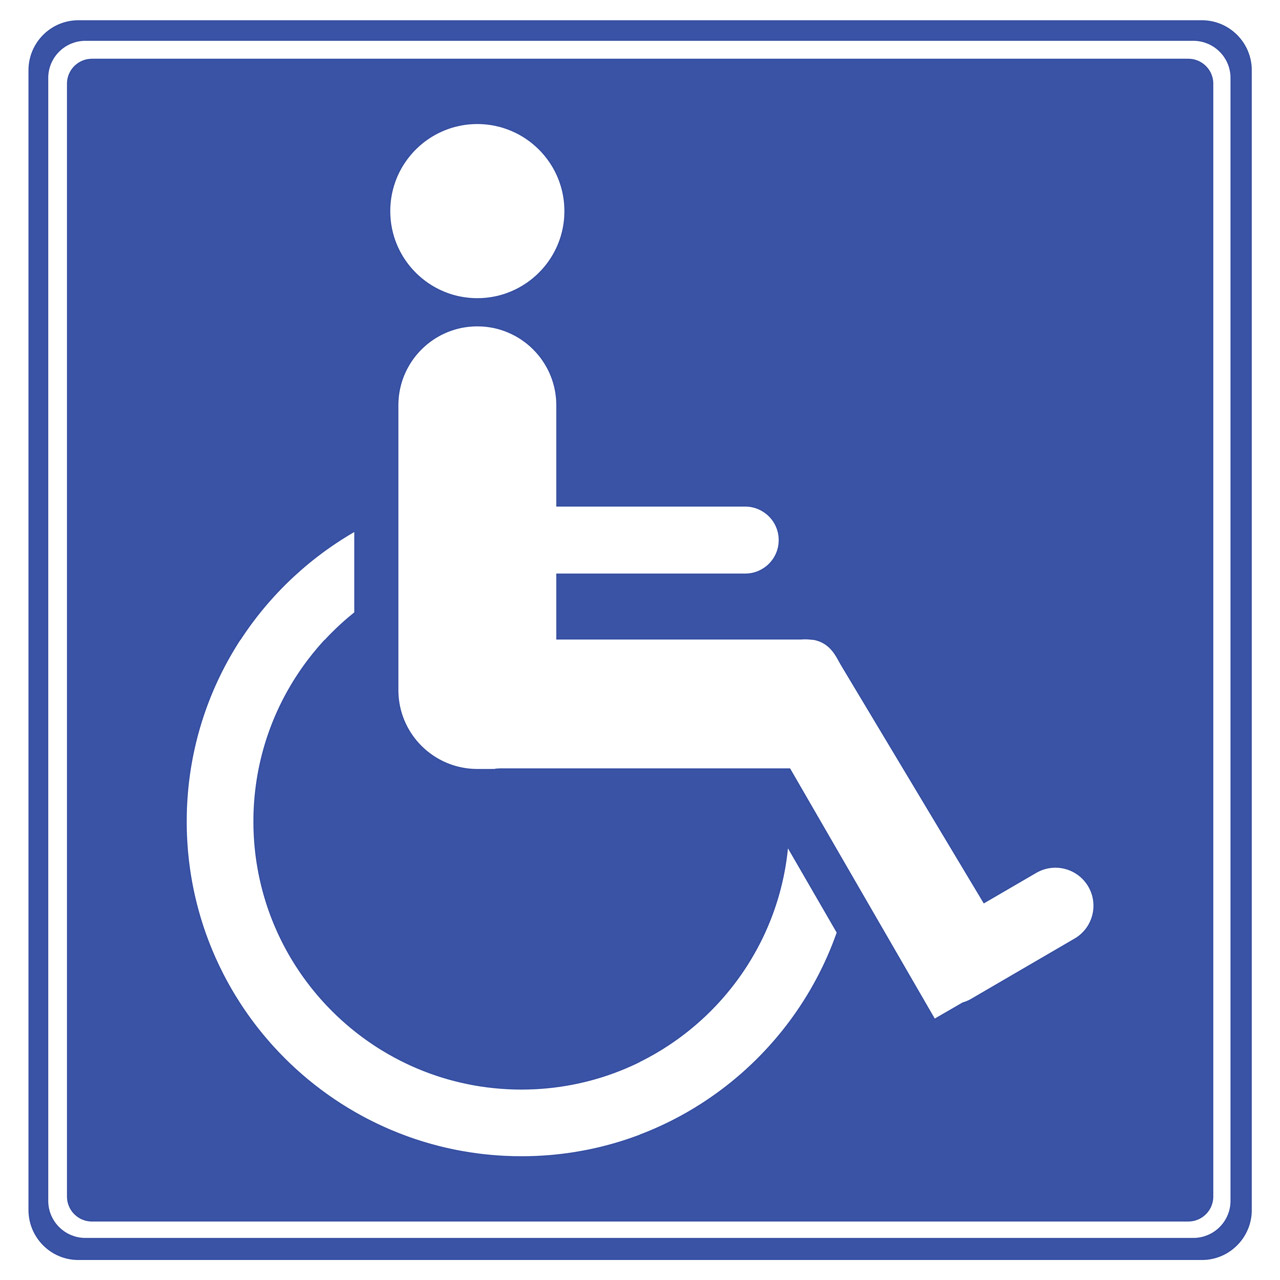 - Disabled Logos